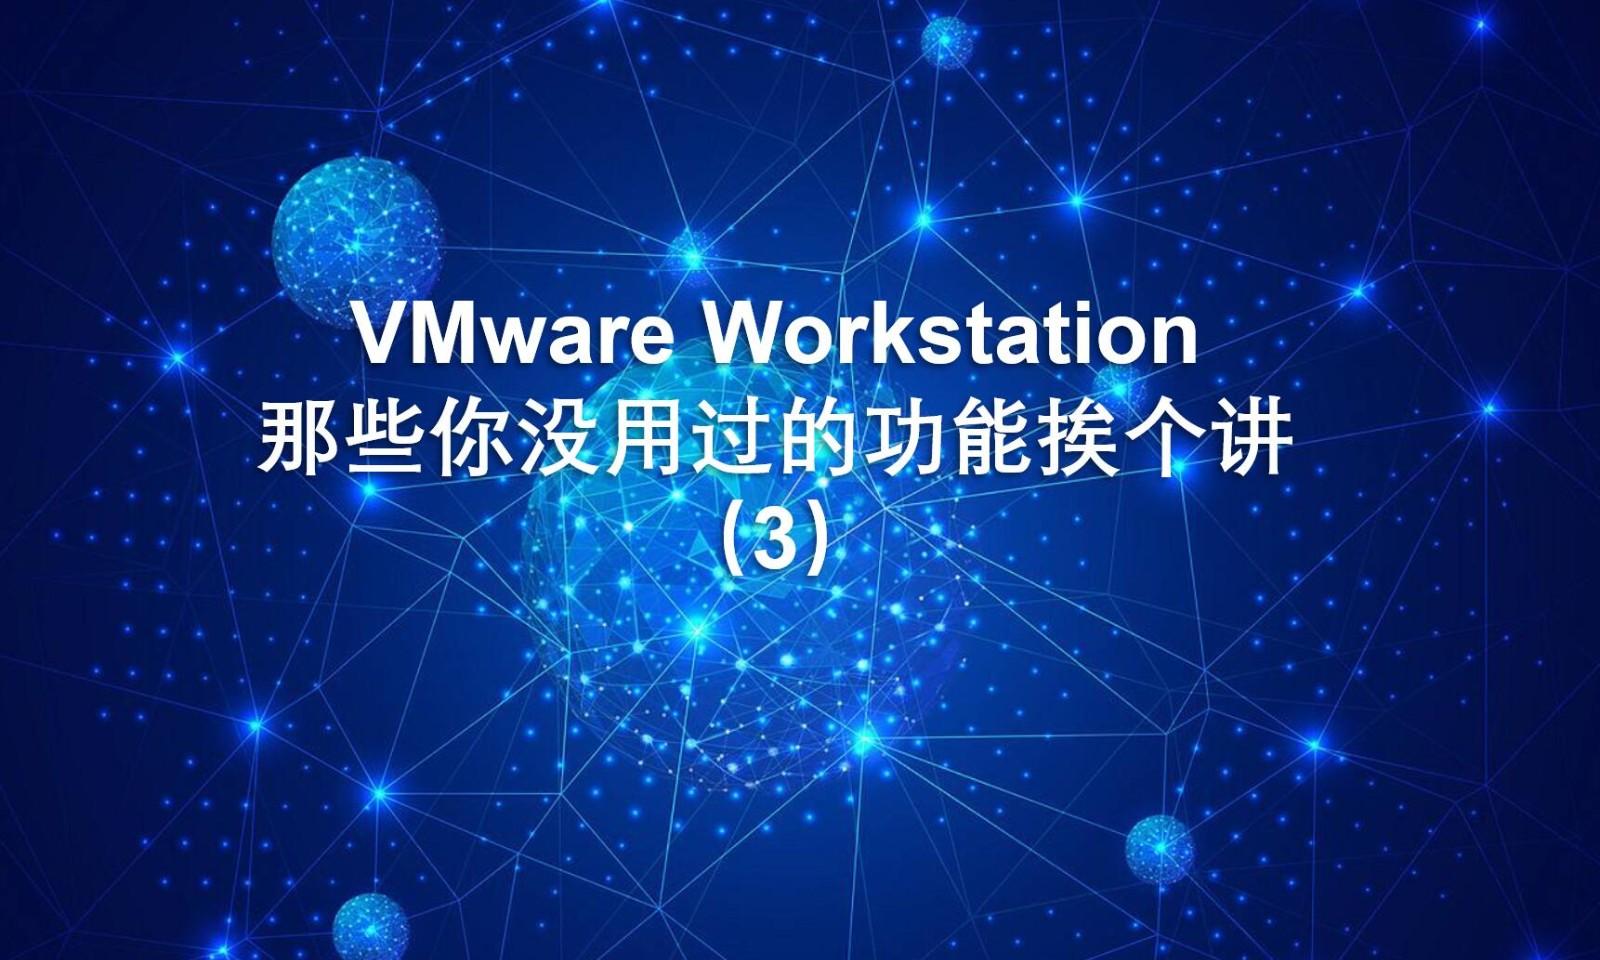 VMware Workstation 那些你没用过的功能挨个讲(3)